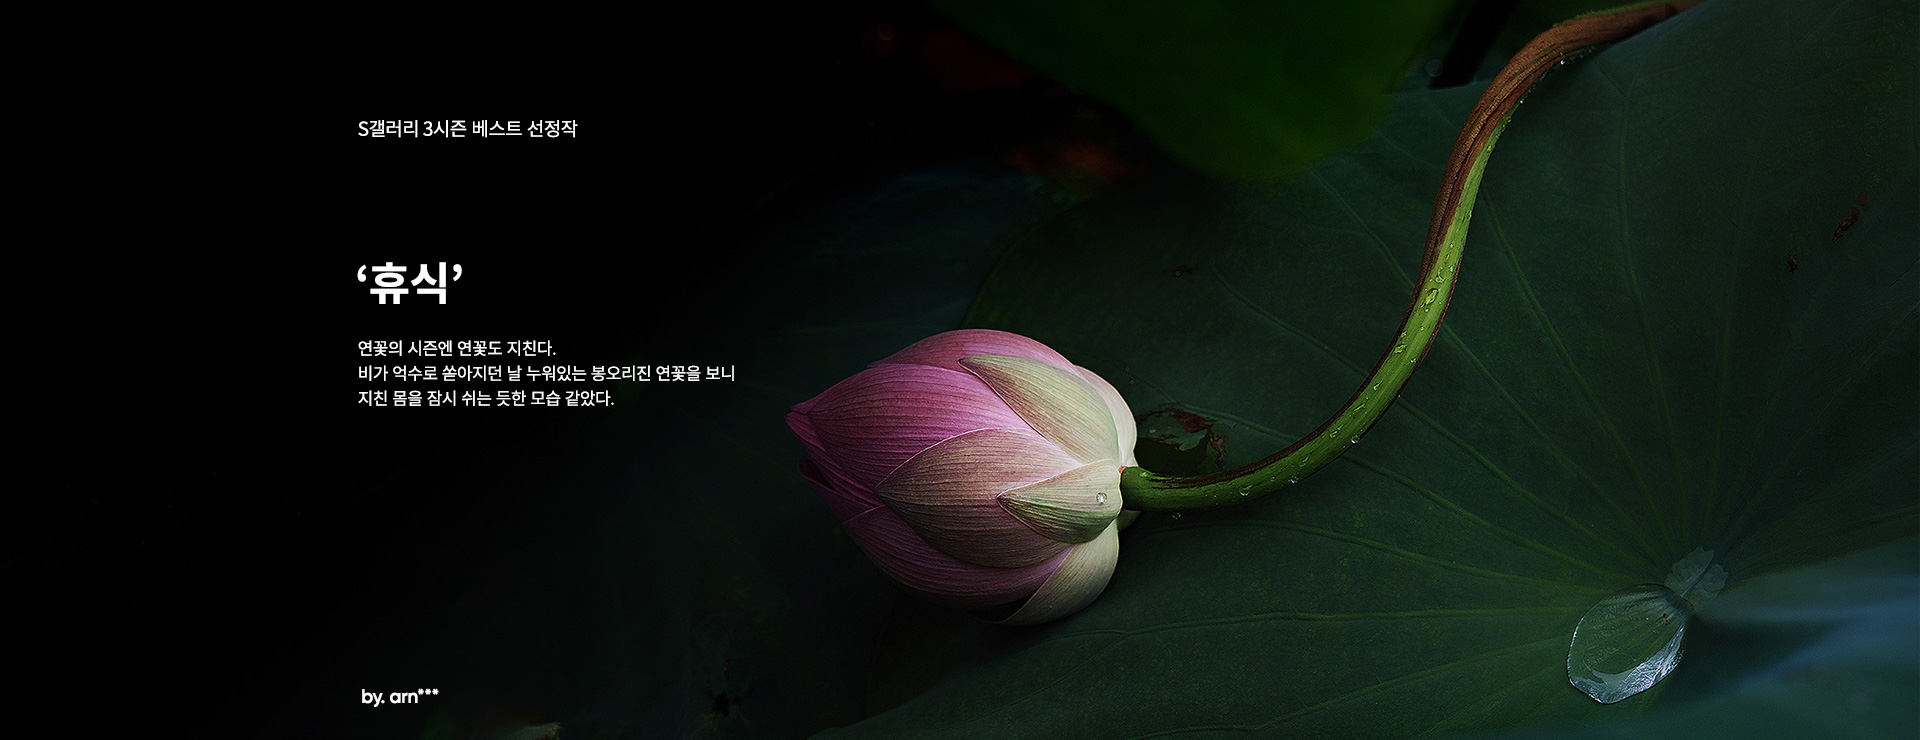 S갤러리 3시즌 베스트 선정작